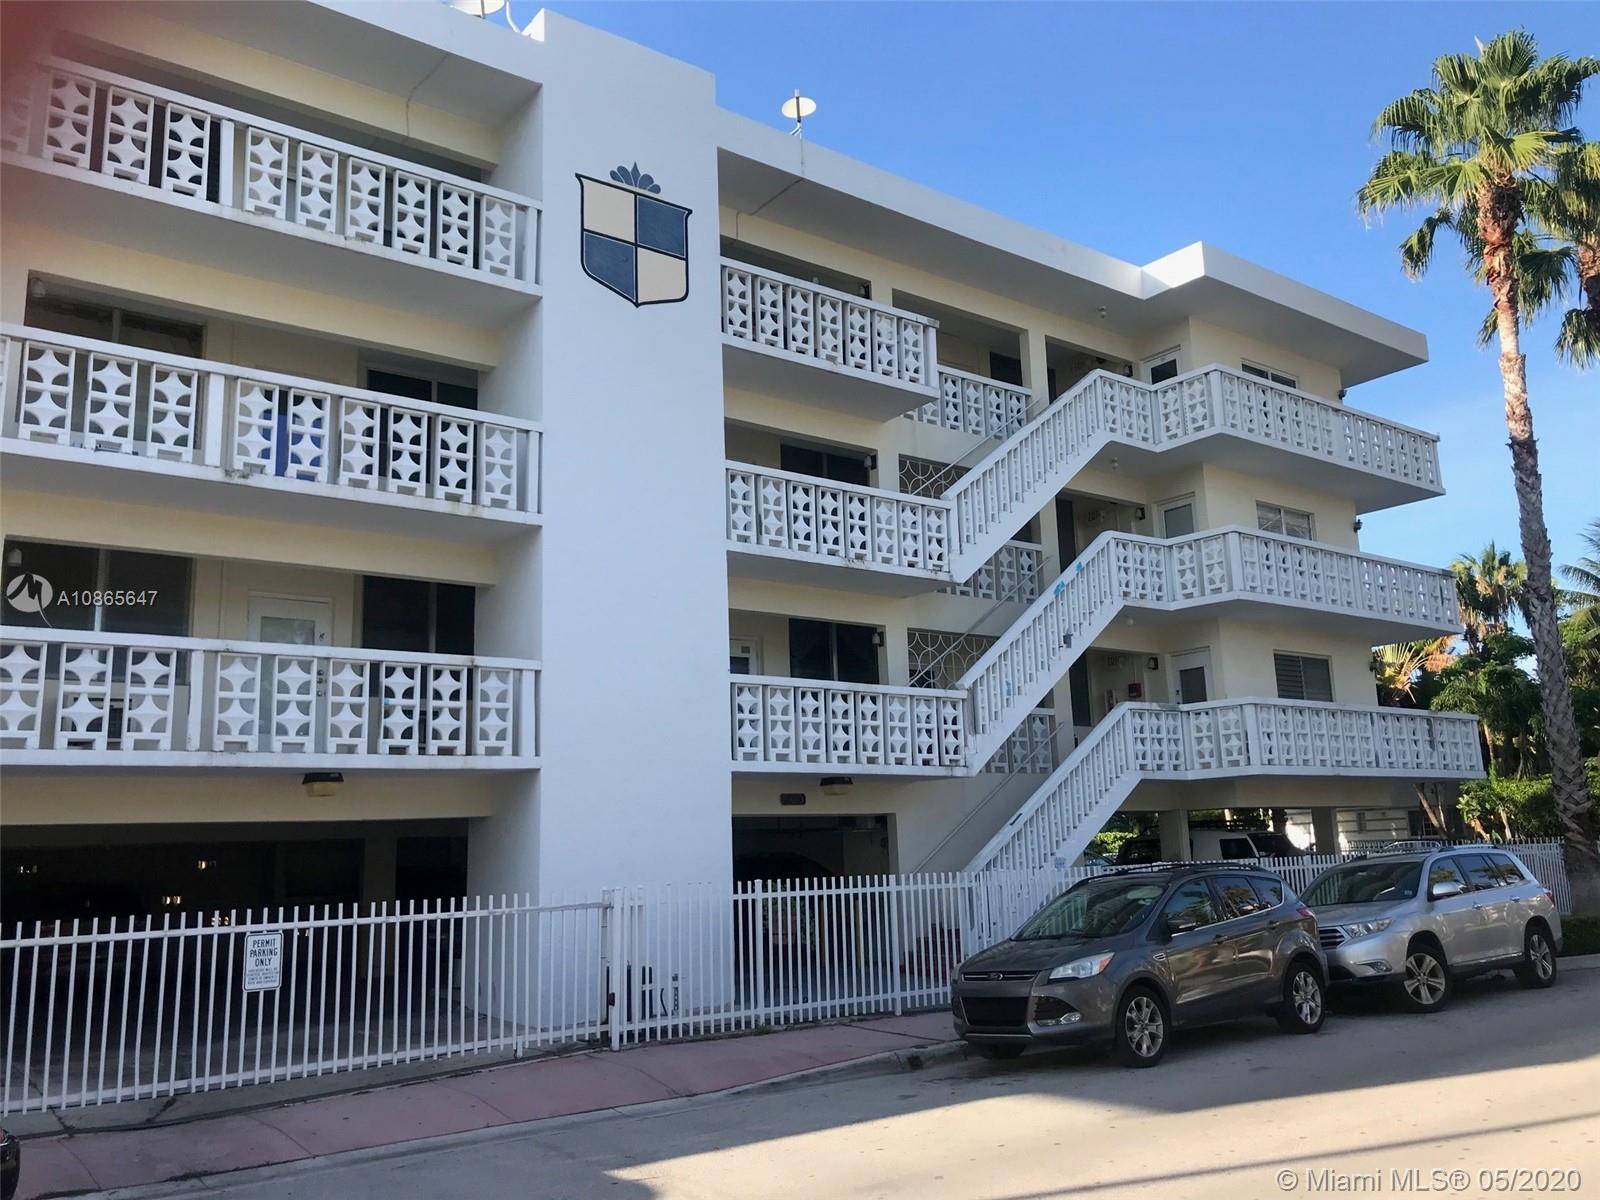 900 Euclid Ave #17, Miami Beach, FL 33139 - Miami Beach, FL real estate listing